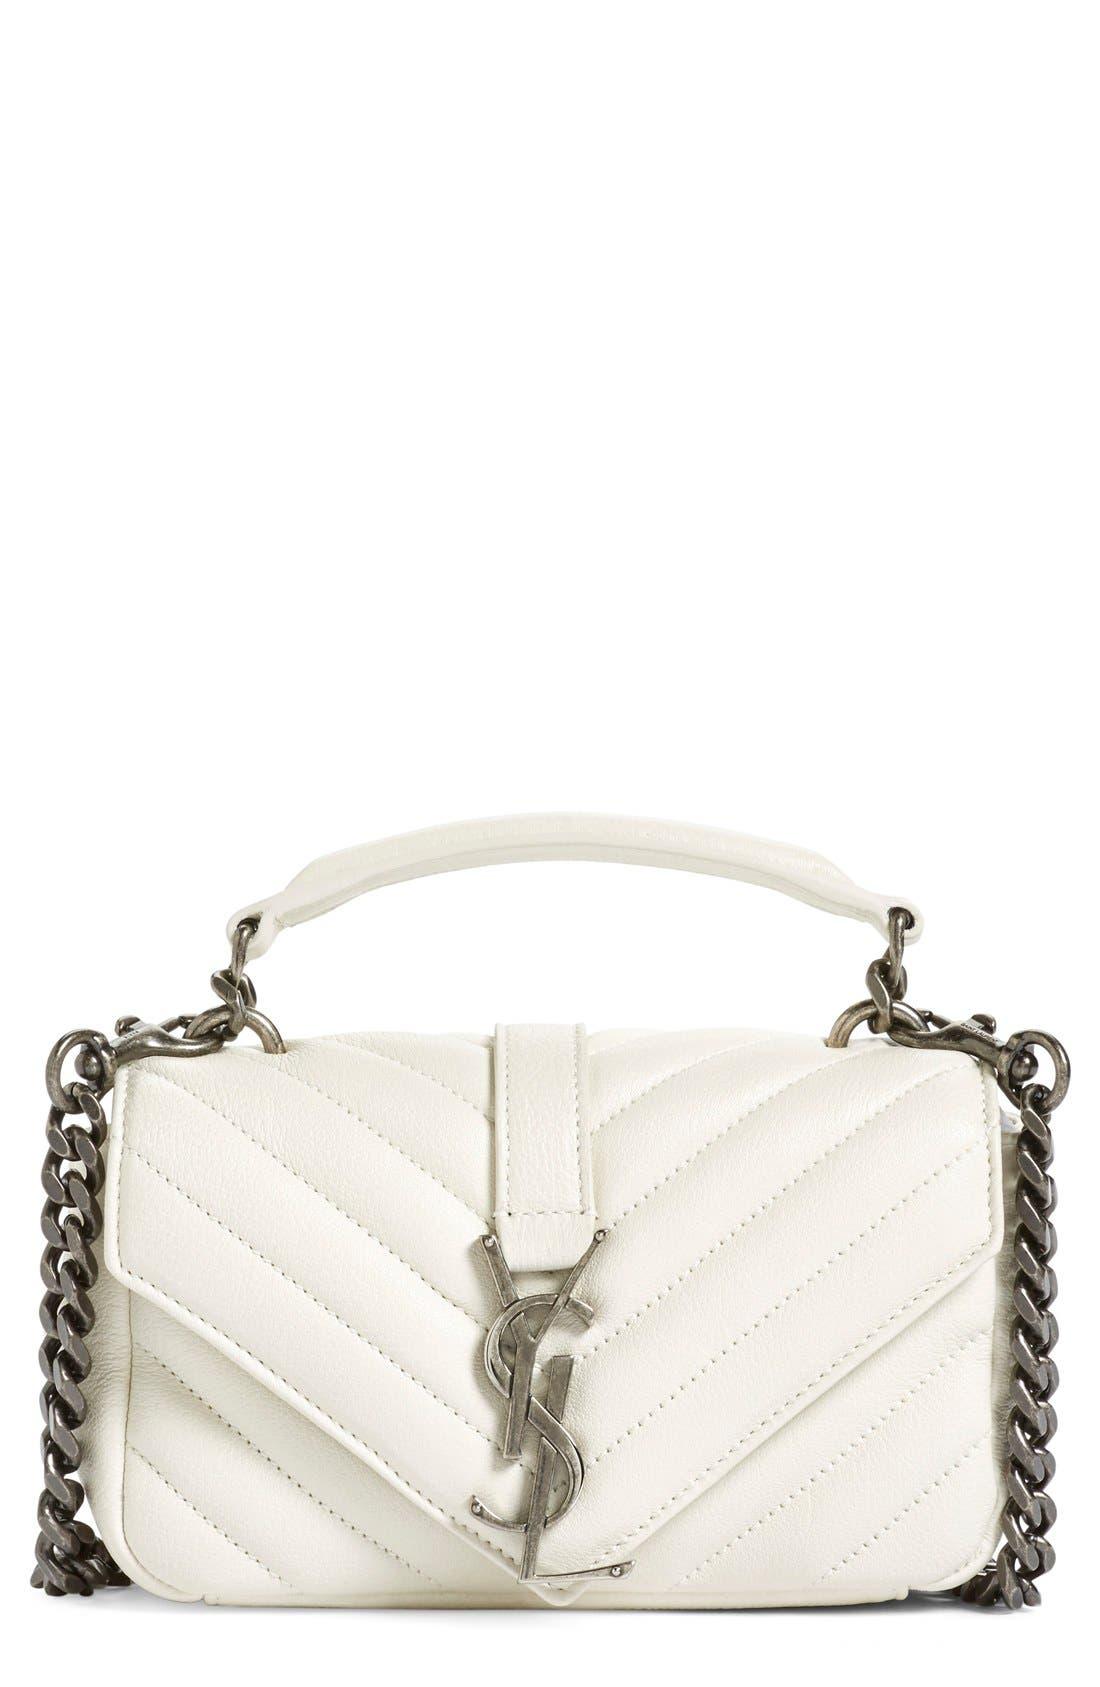 Alternate Image 1 Selected - Saint Laurent 'Monogram' Shoulder Bag